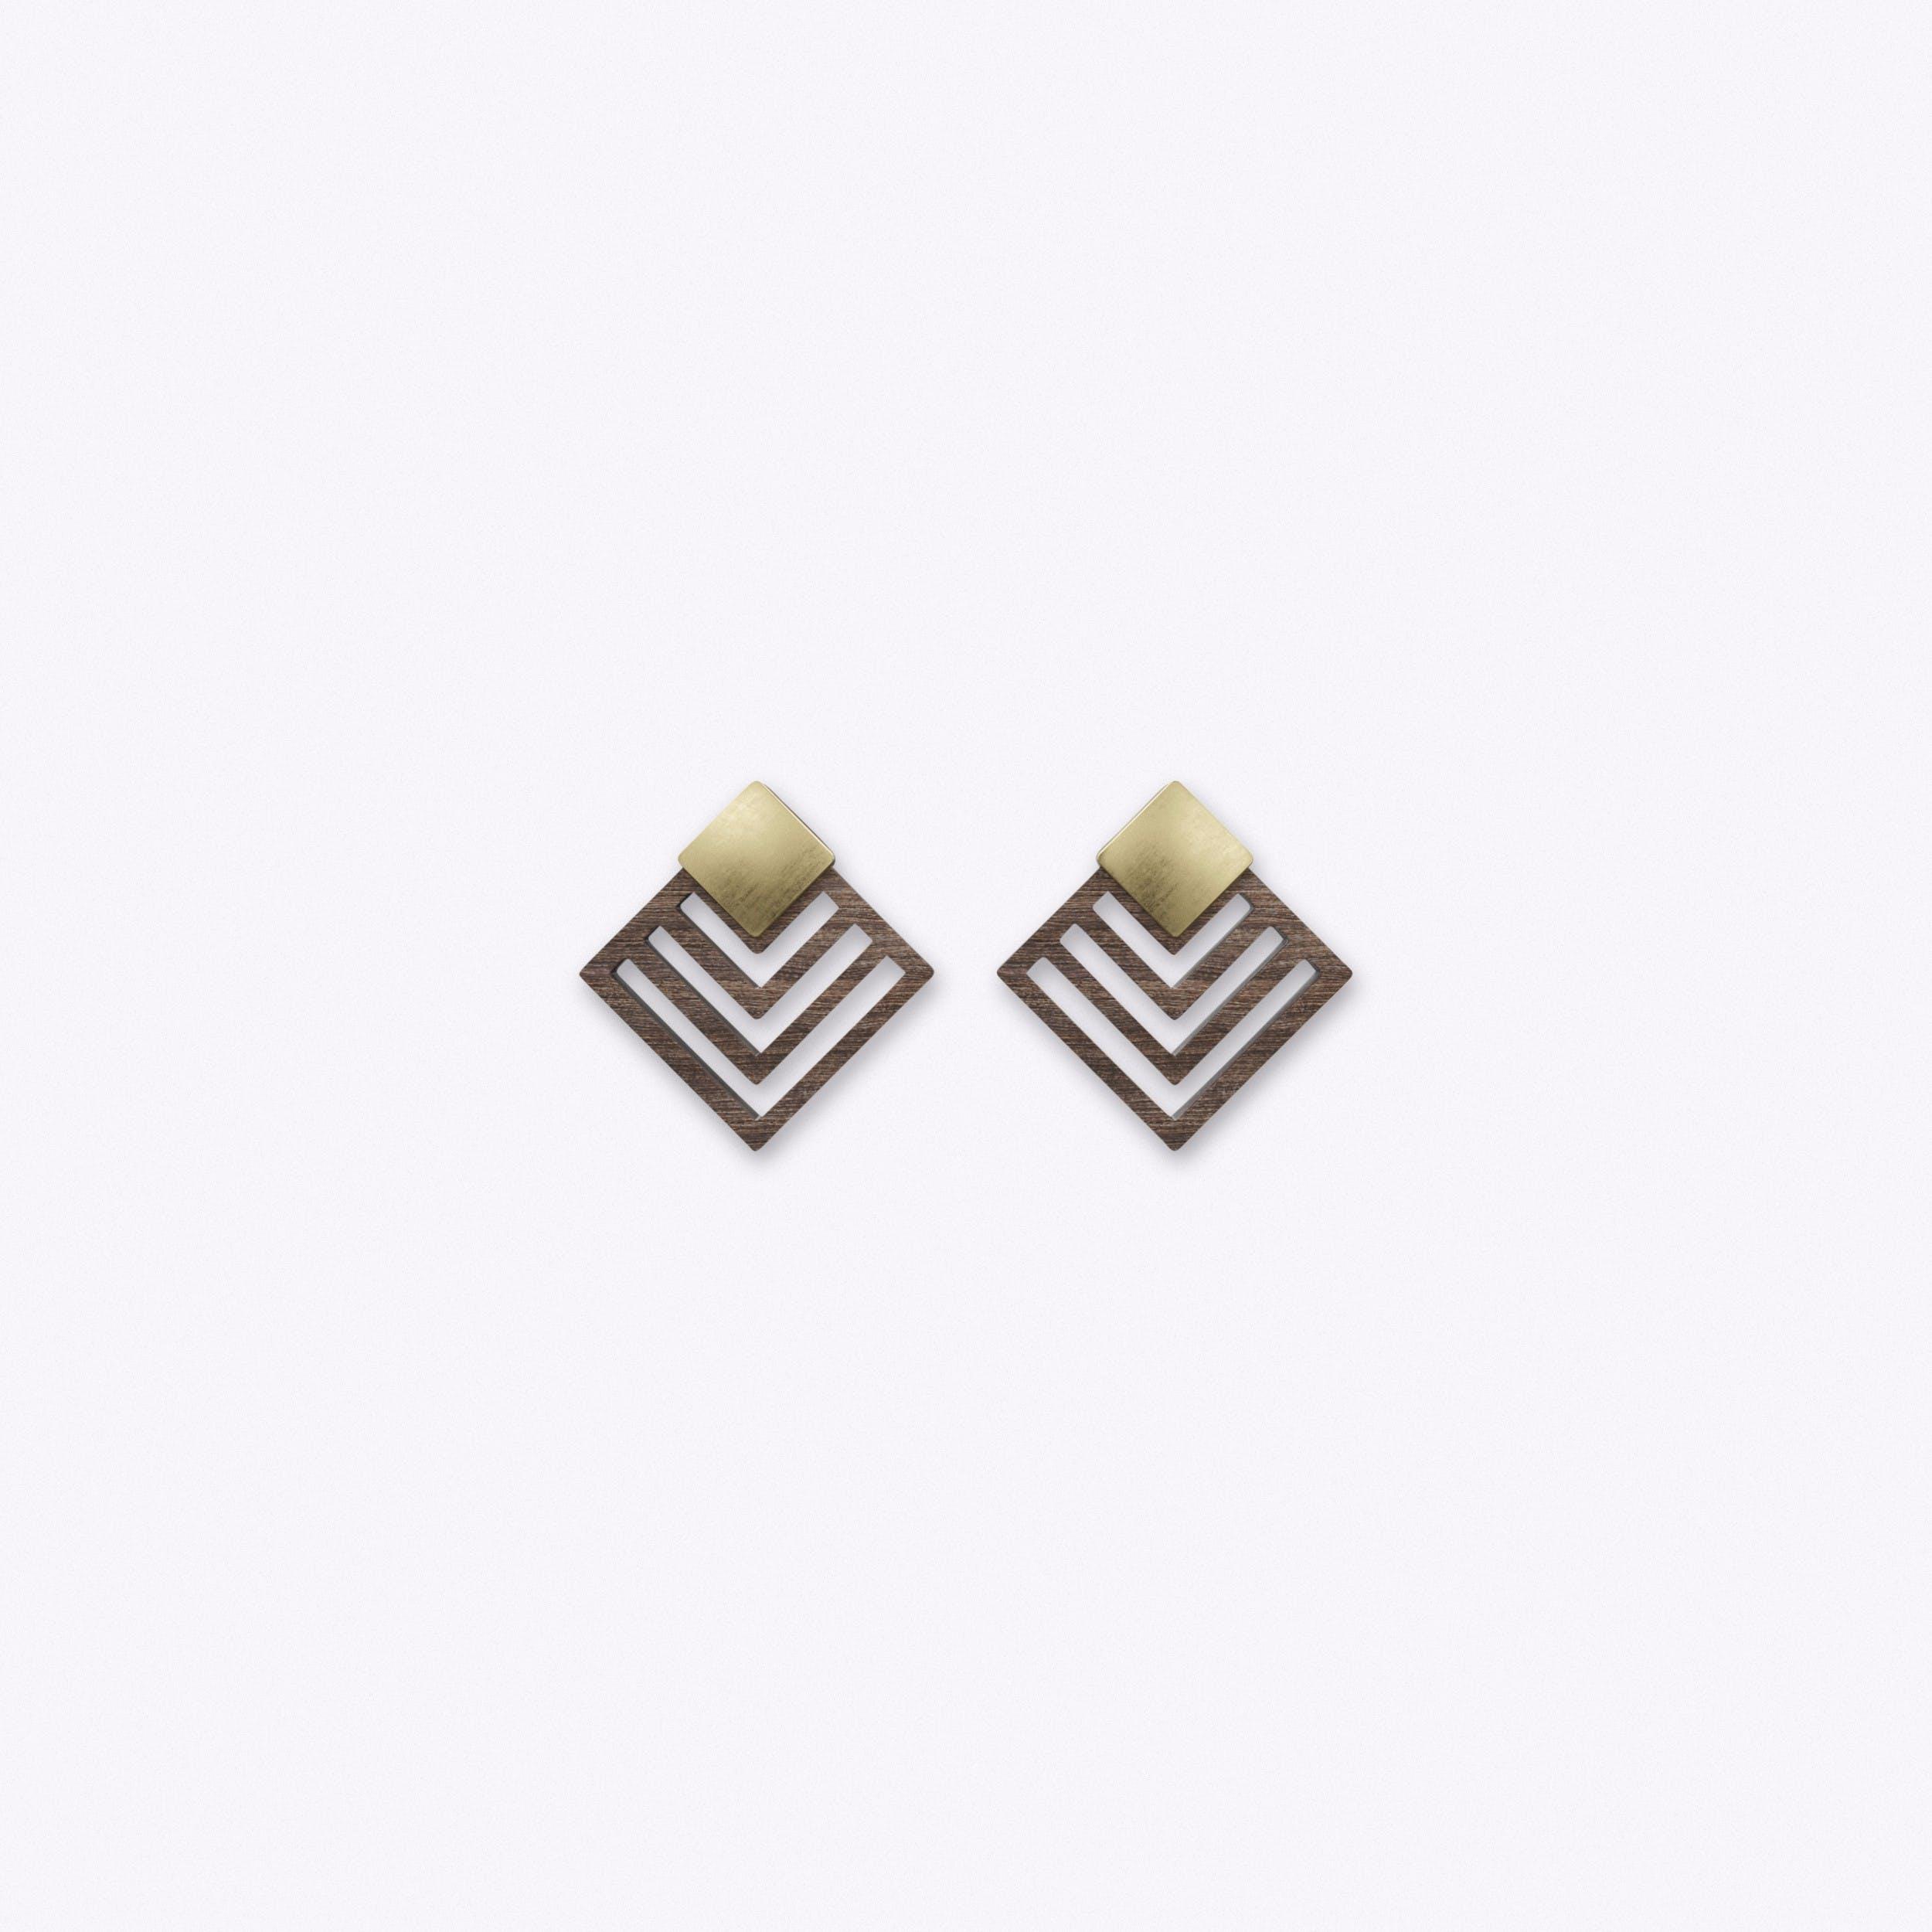 Aktiv Earrings in Dark Wood